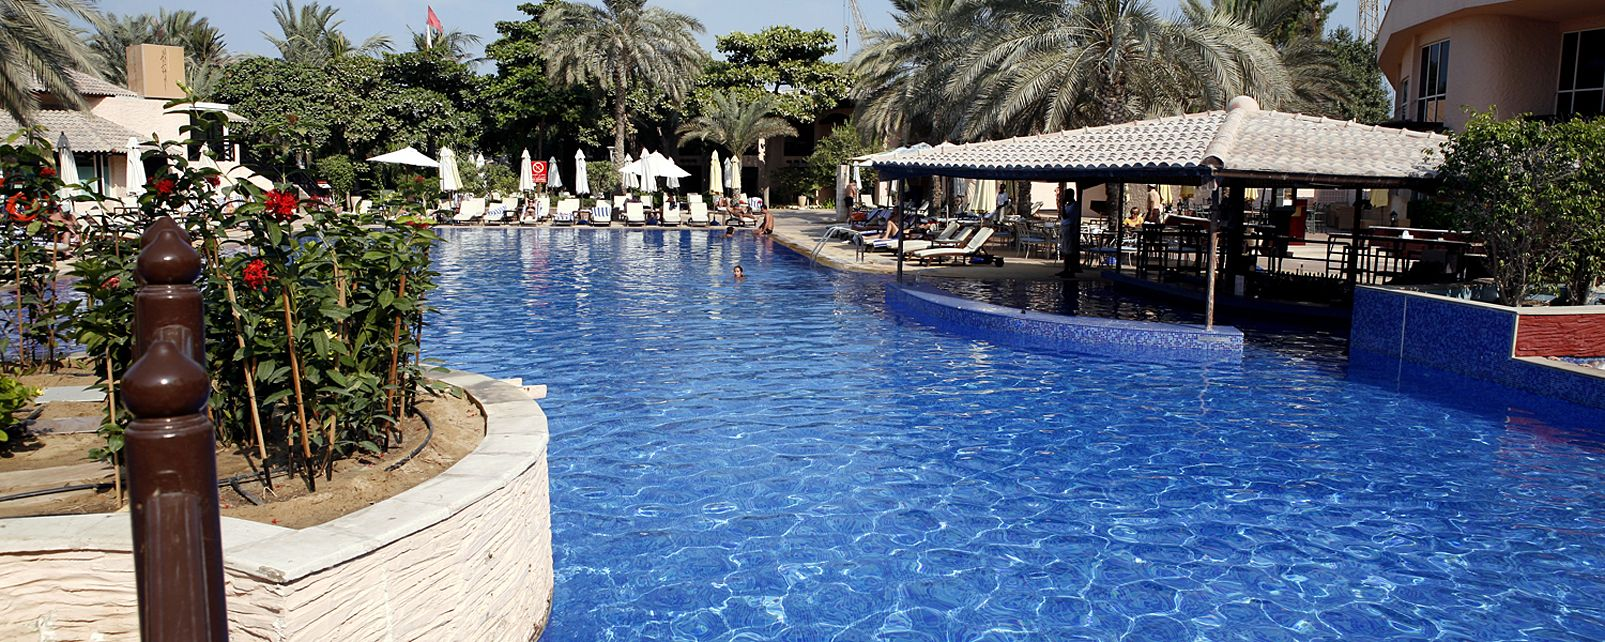 Hôtel Habtoor Grand Resort and Spa